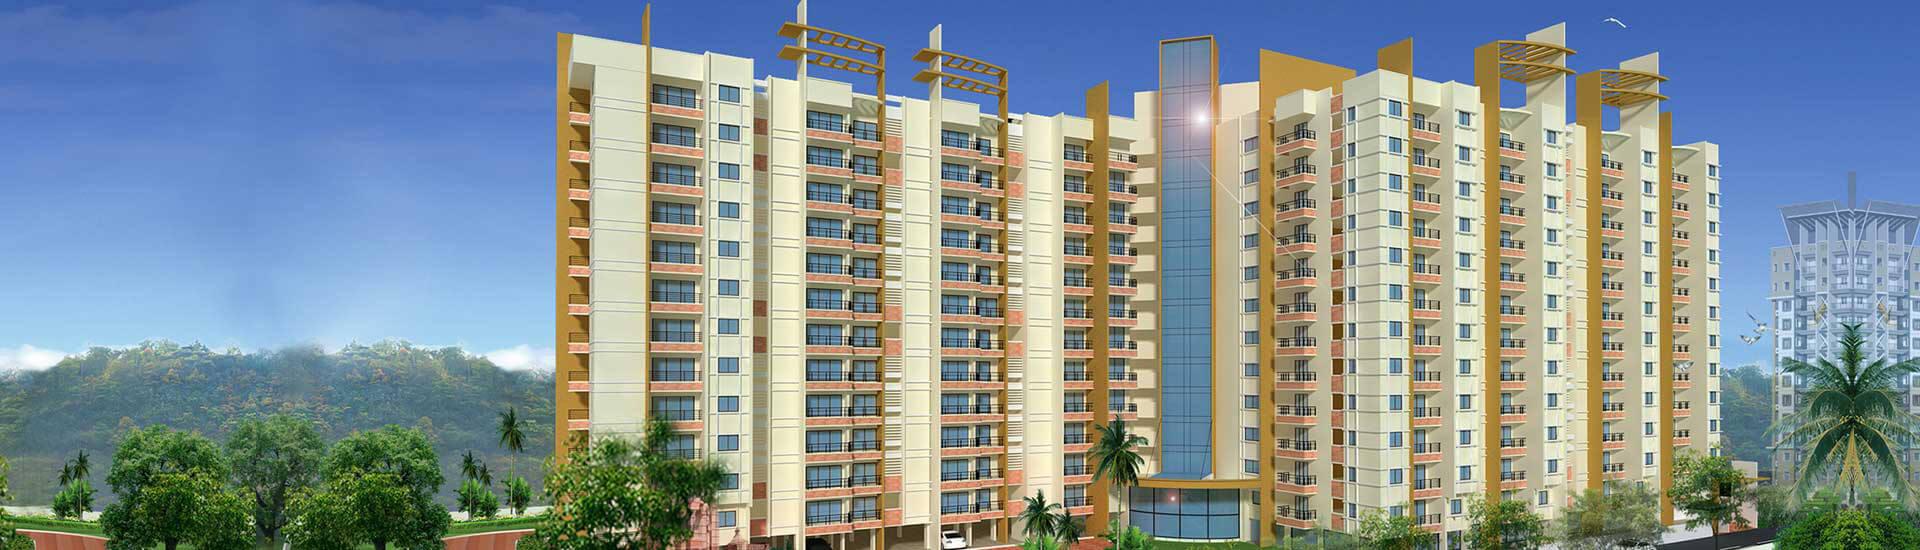 SMR Vinay Endeavour Whitefield Bangalore 4786